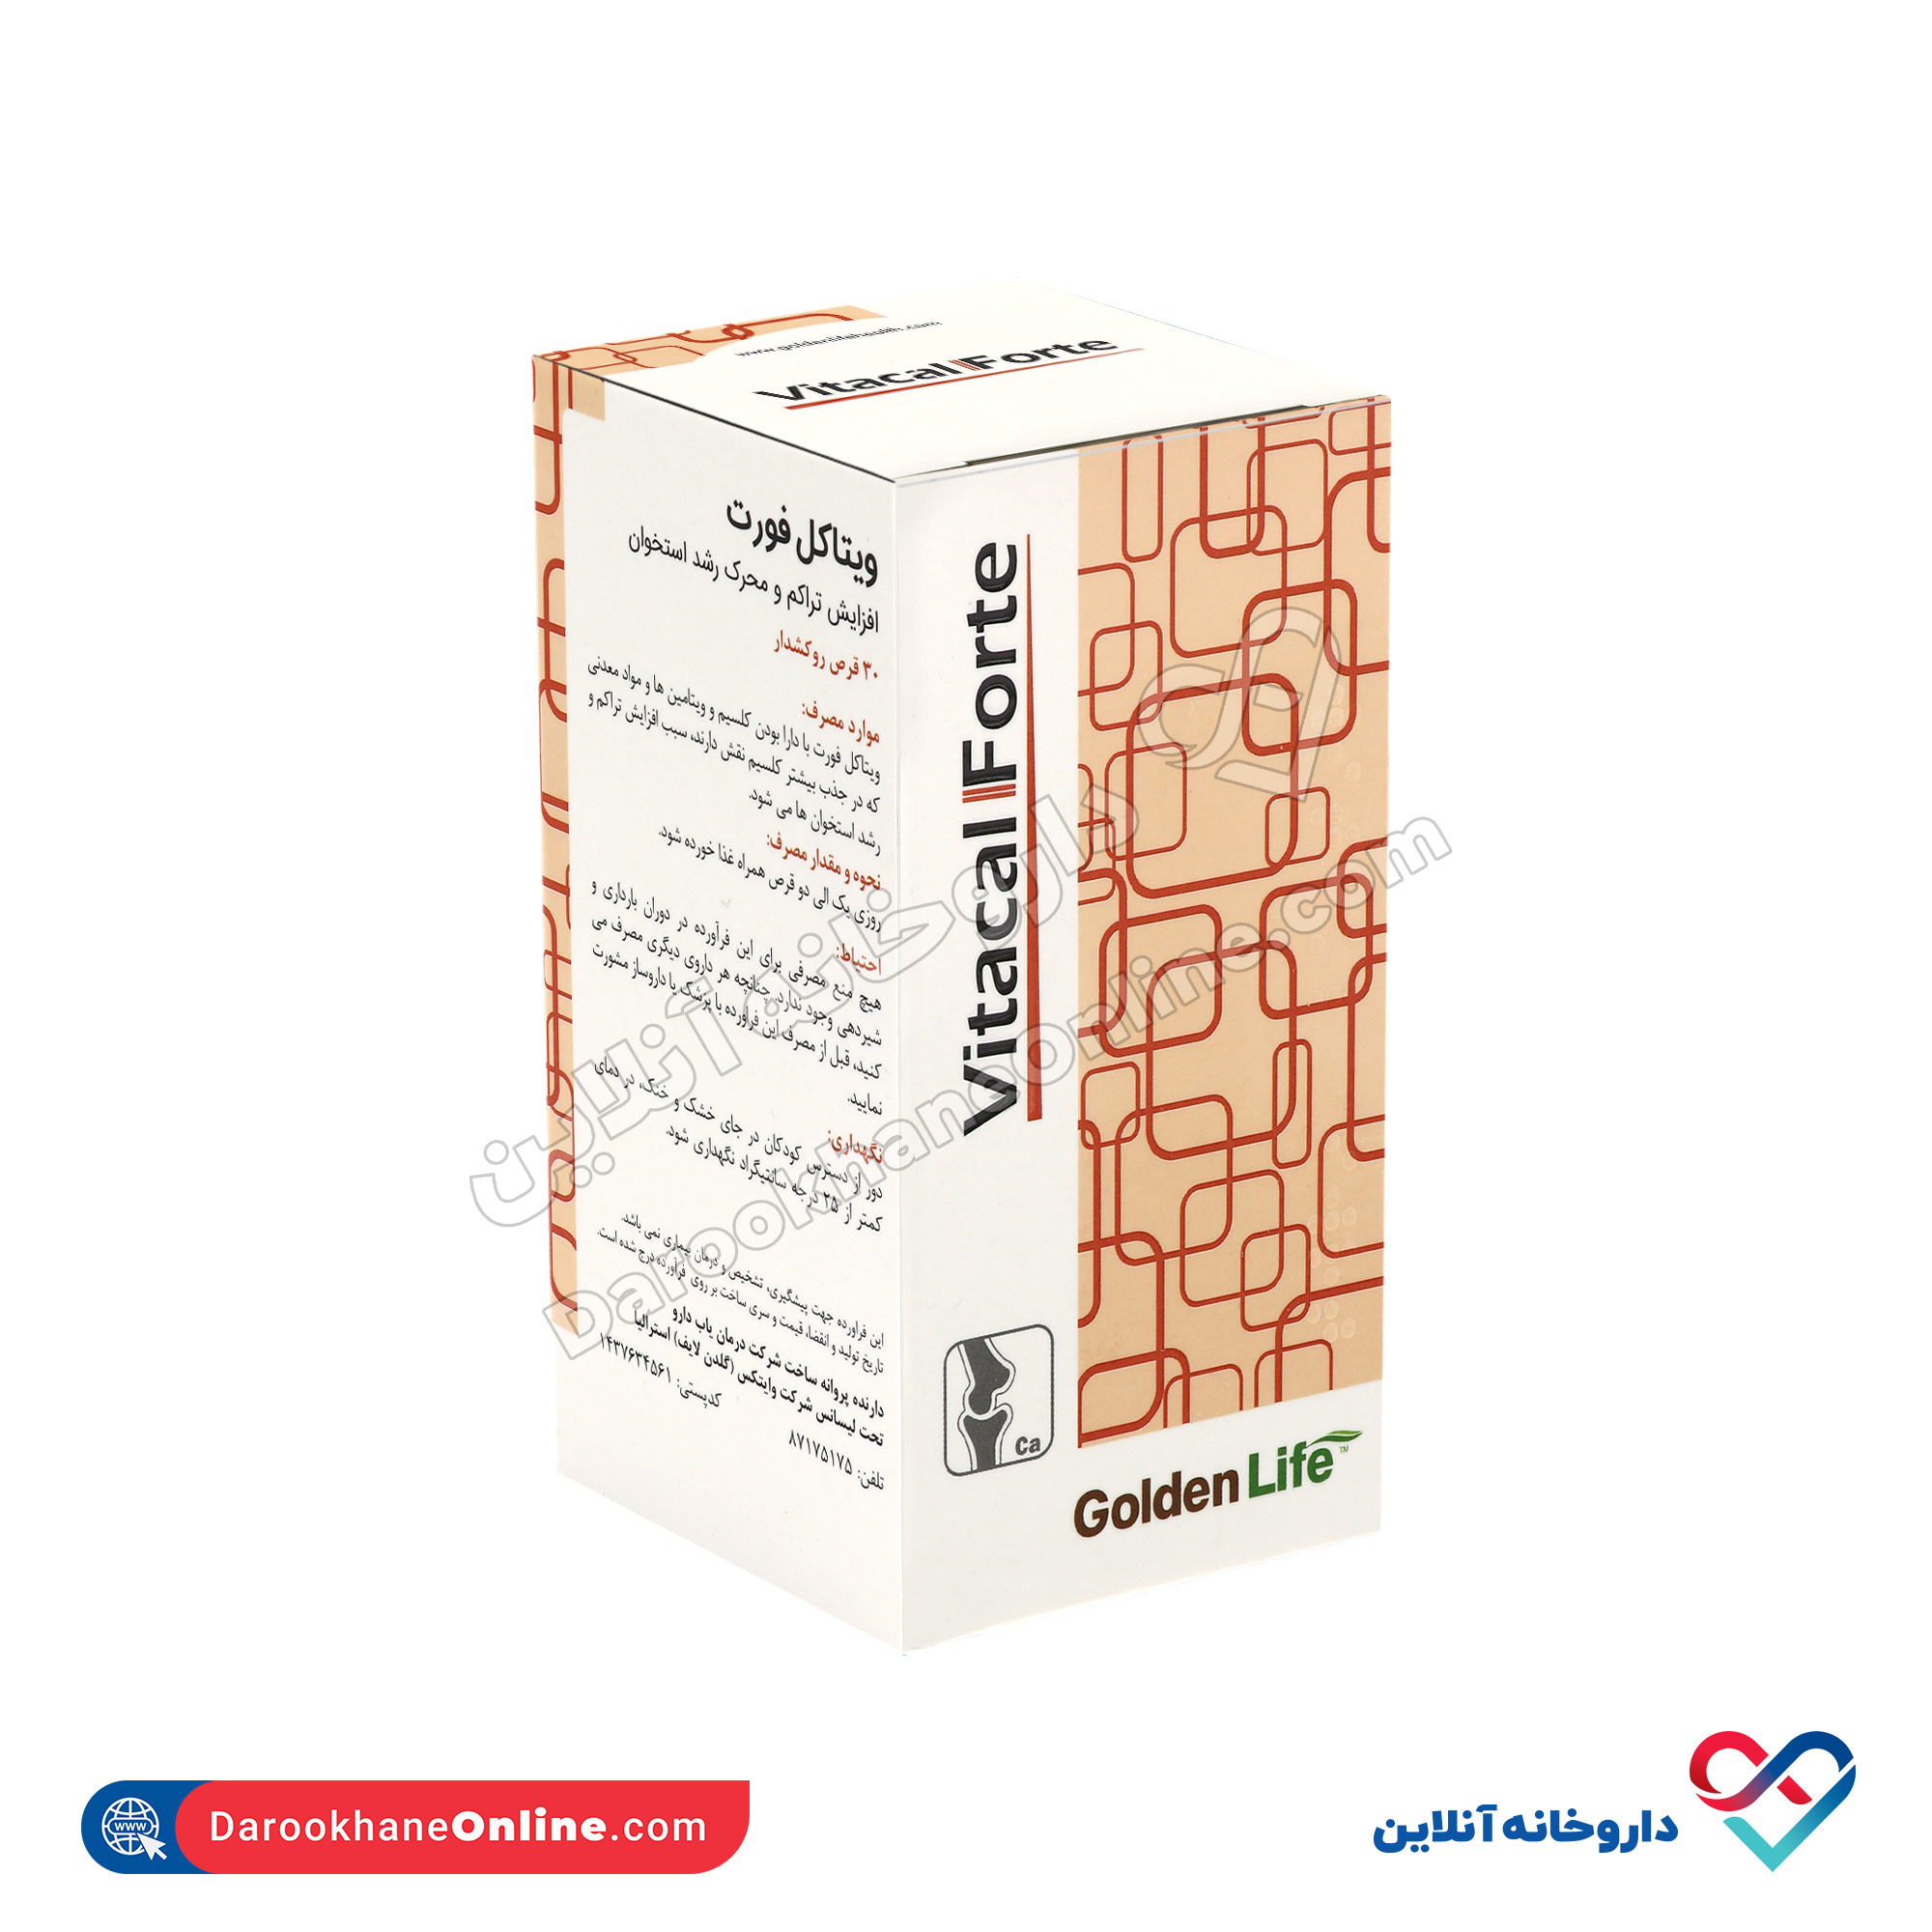 قرص ویتاکل فورت گلدن لایف   30 عدد   افزایش تراکم، حفظ سلامتی و رشد استخوان